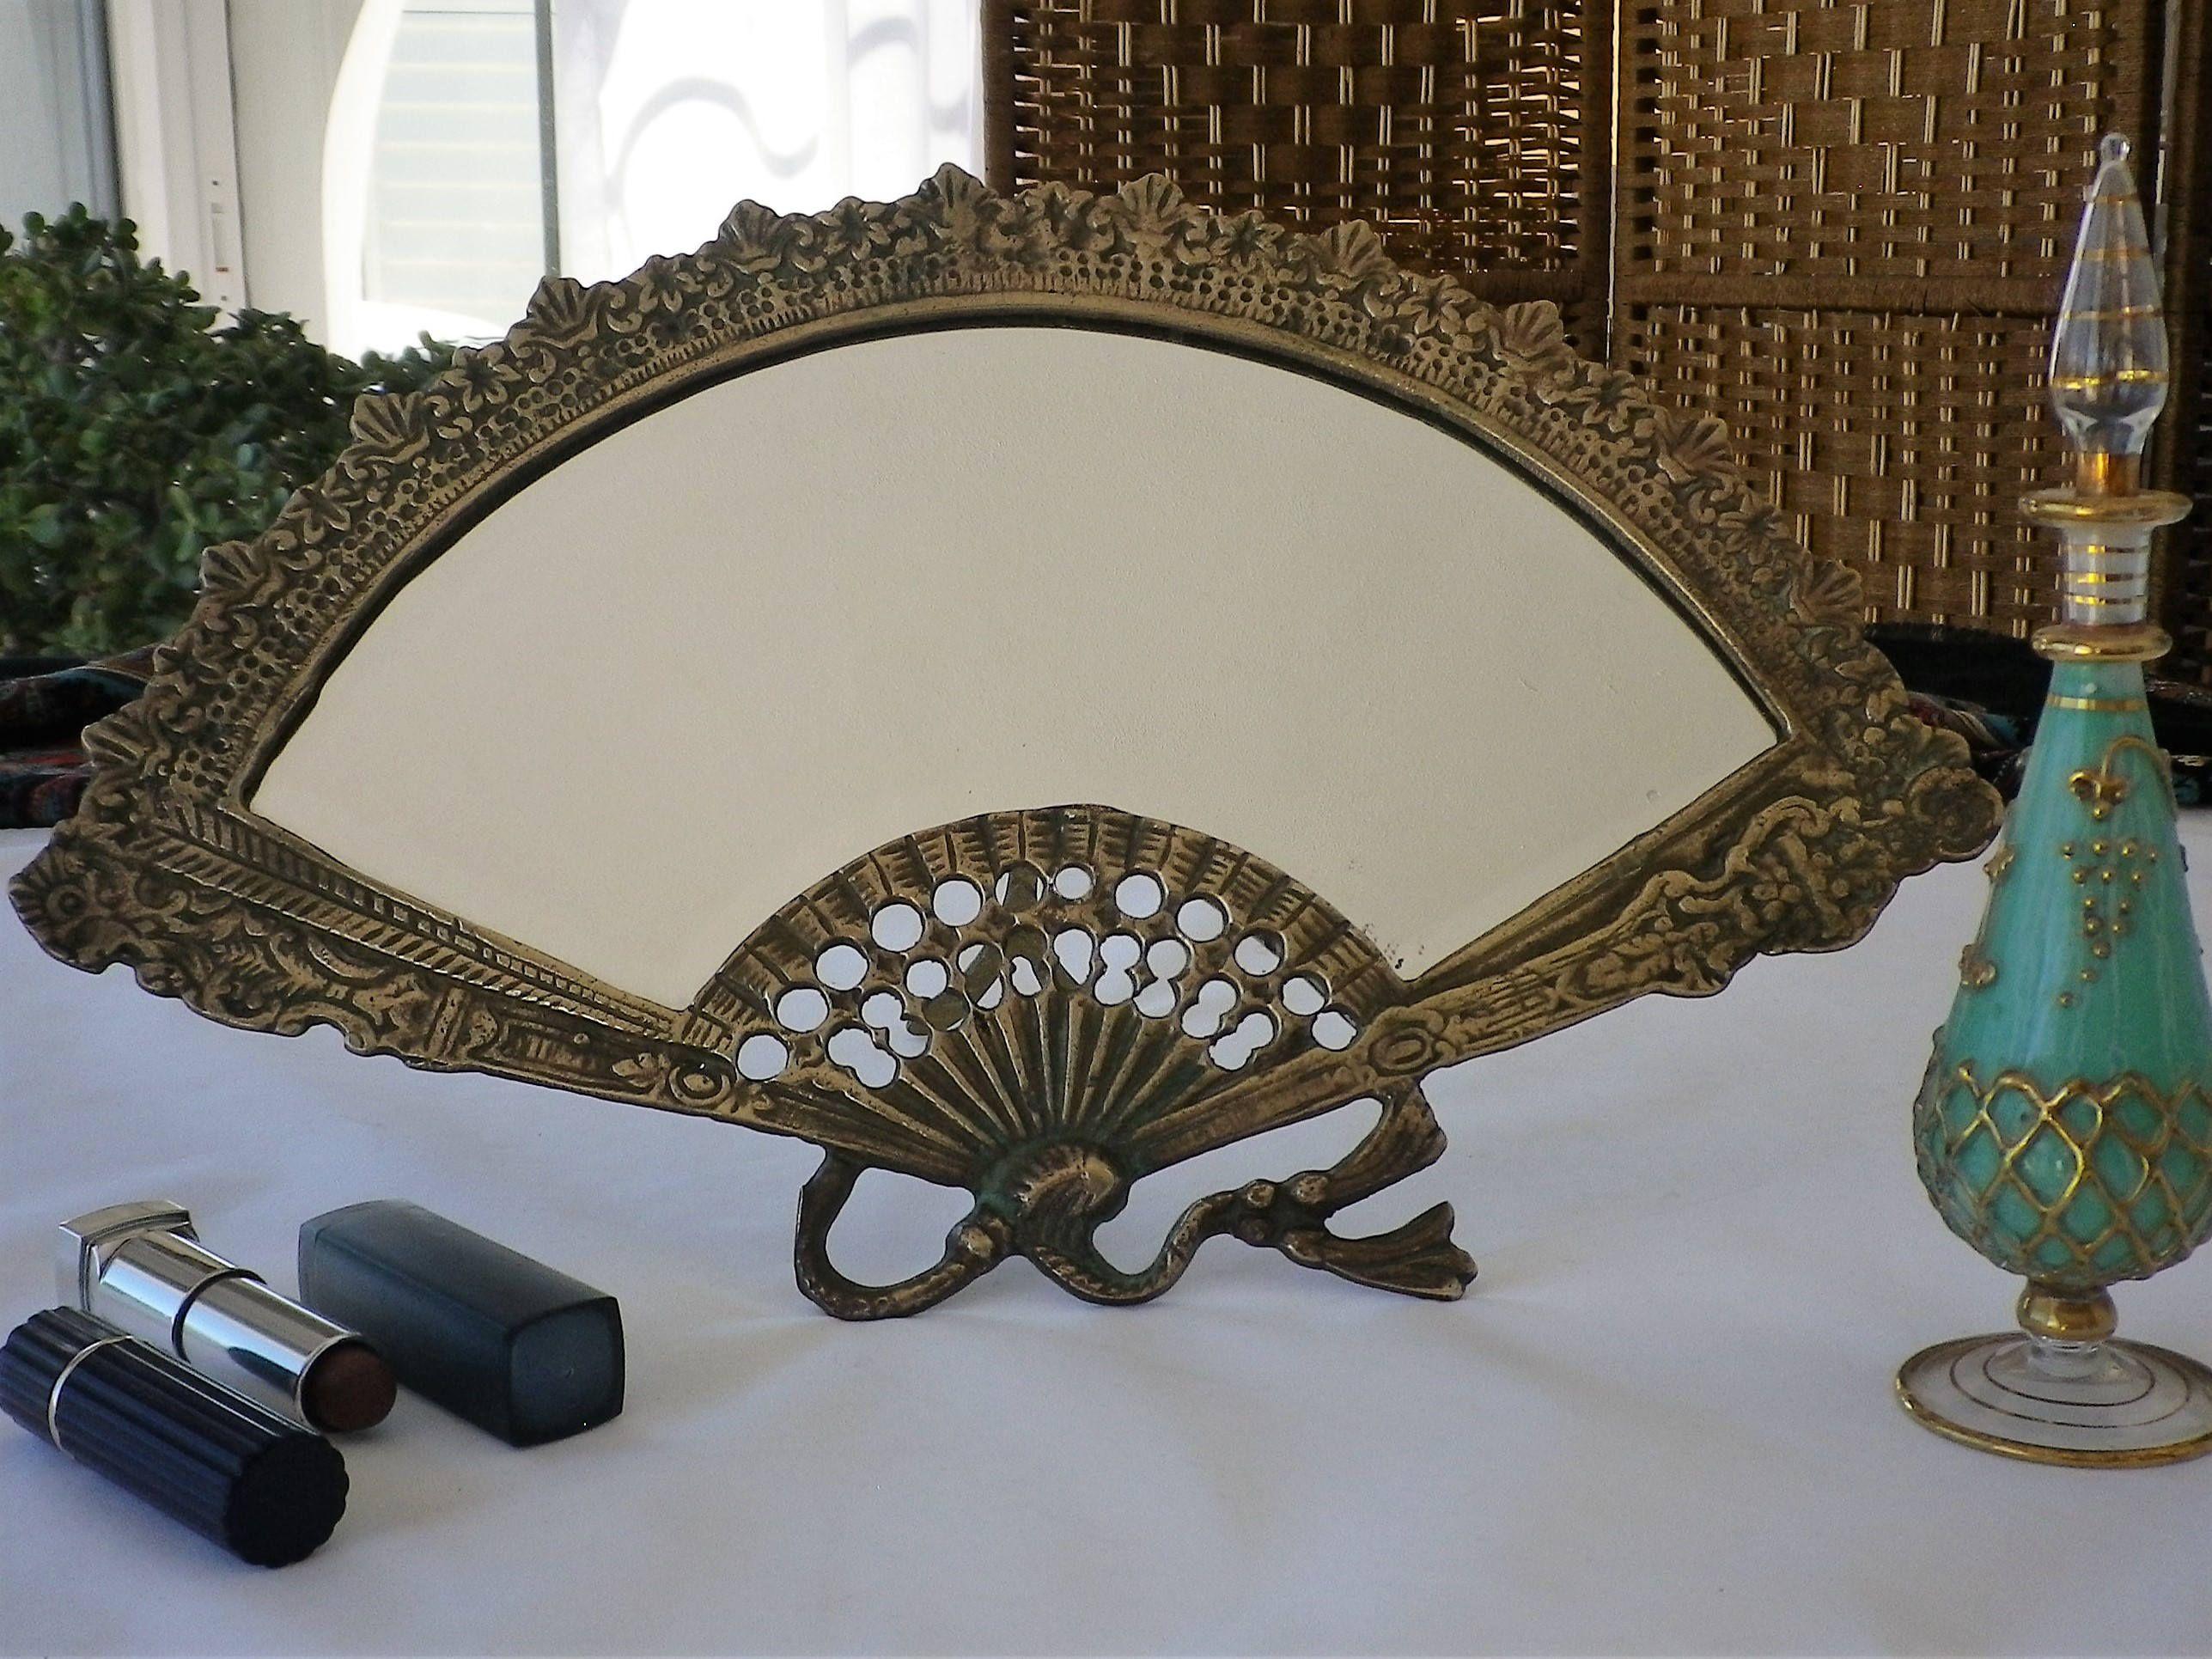 Fan shaped vanity mirror with original bevel edge glass brass art fan shaped vanity mirror with original bevel edge glass brass art nouveau style geotapseo Gallery